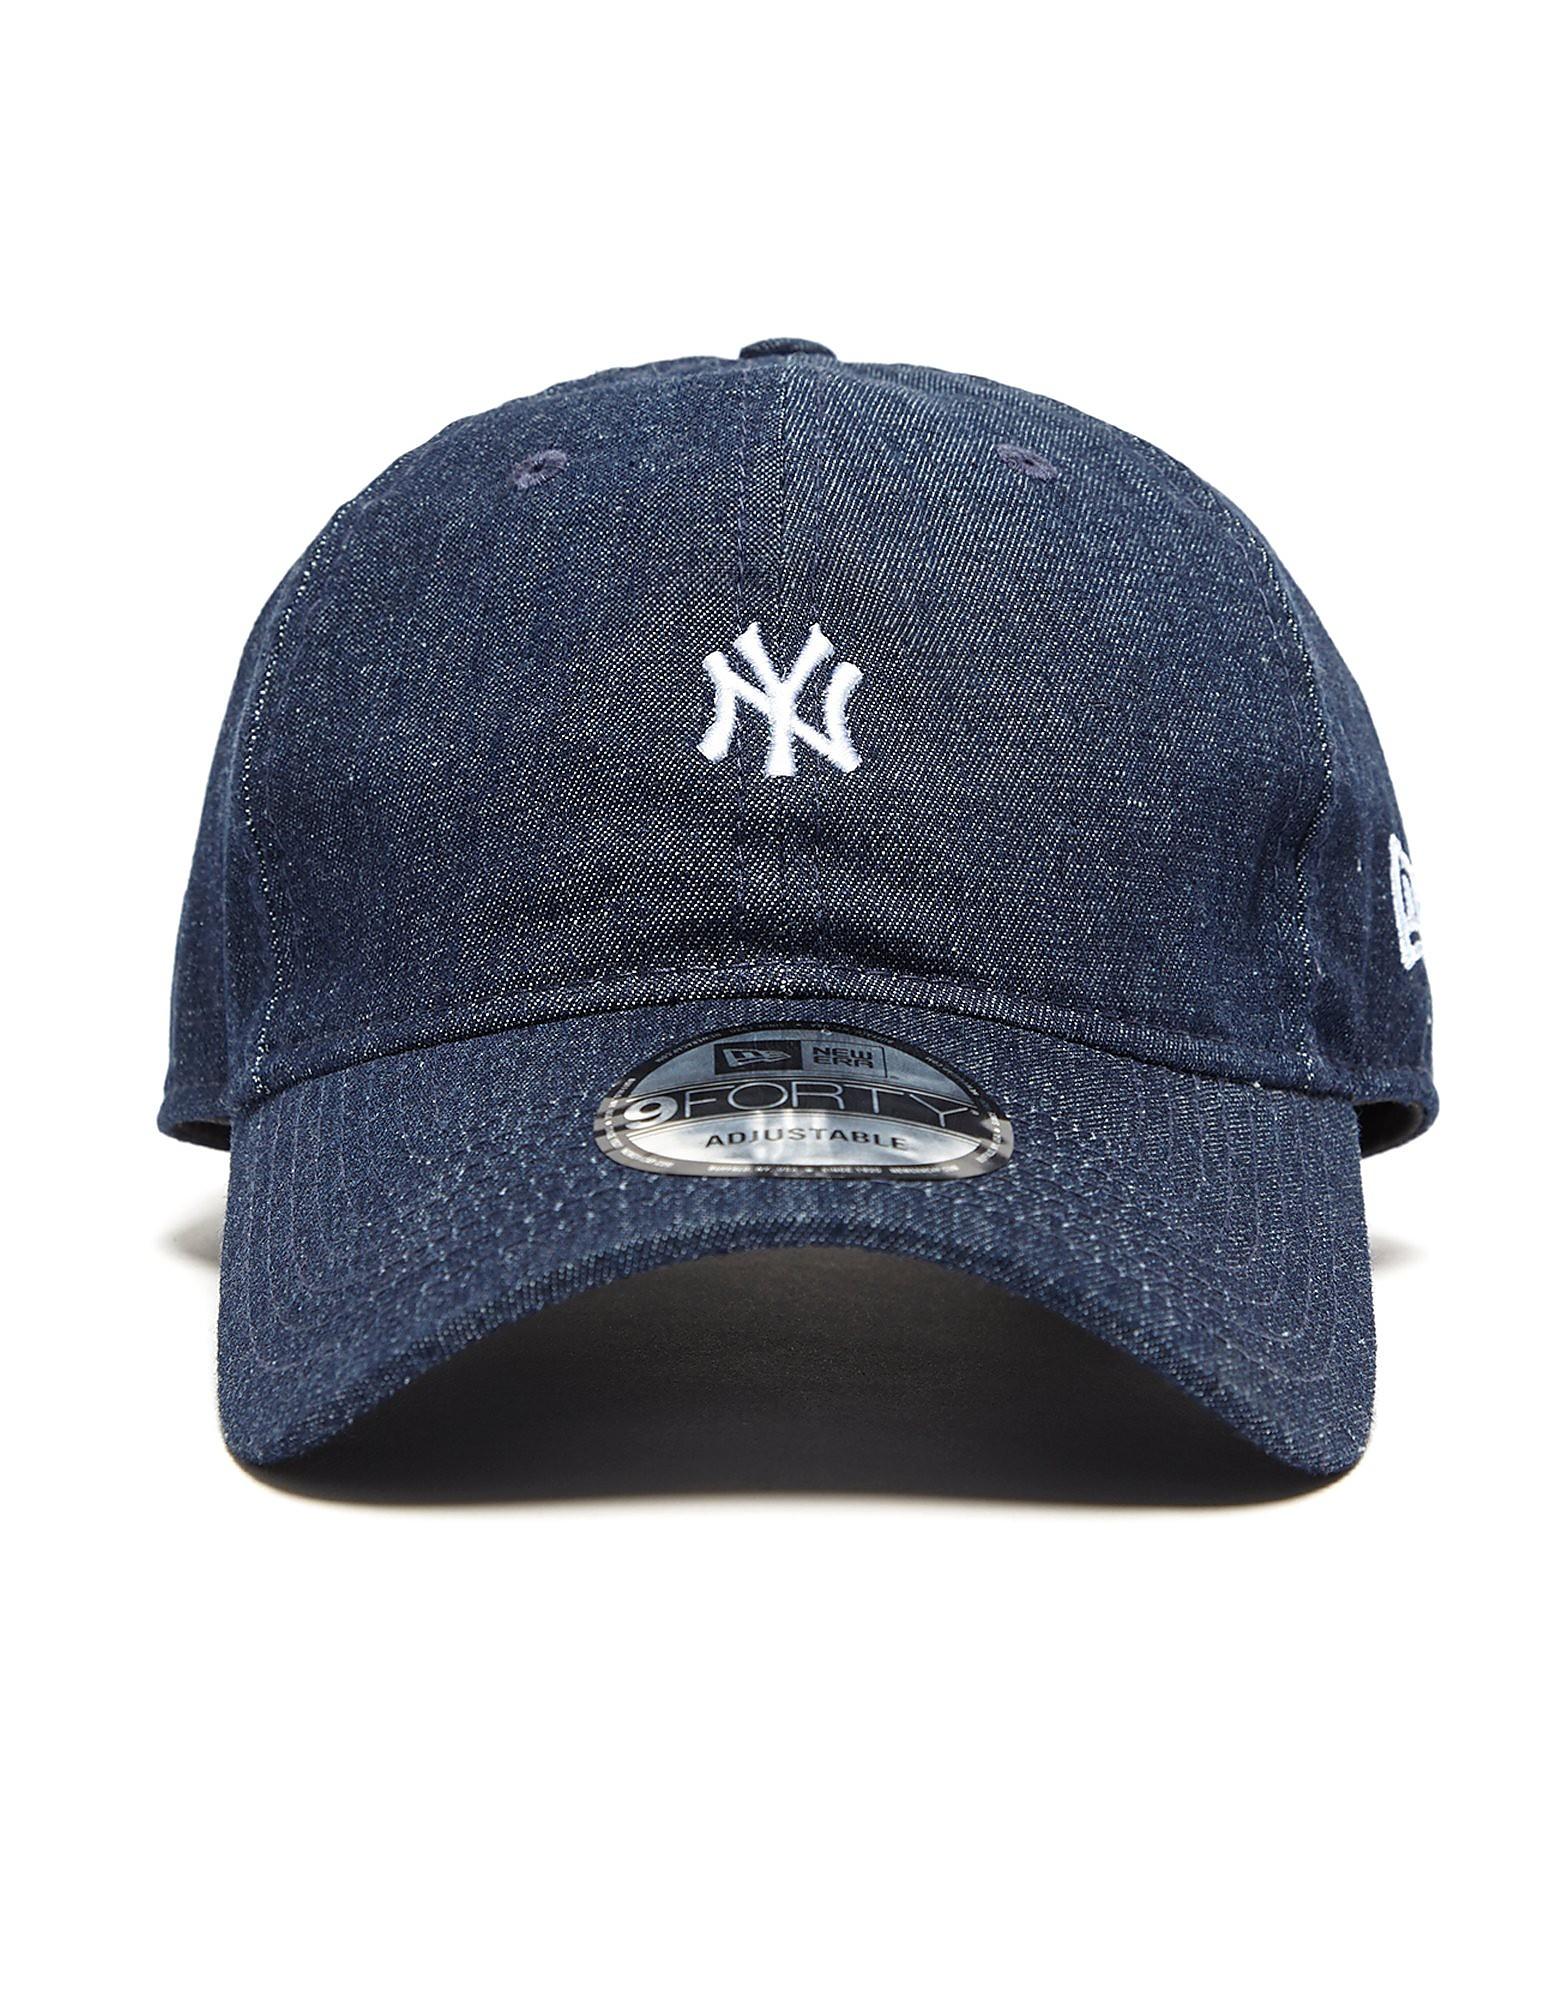 New Era Casquette 9FORTY New York Yankees baseball